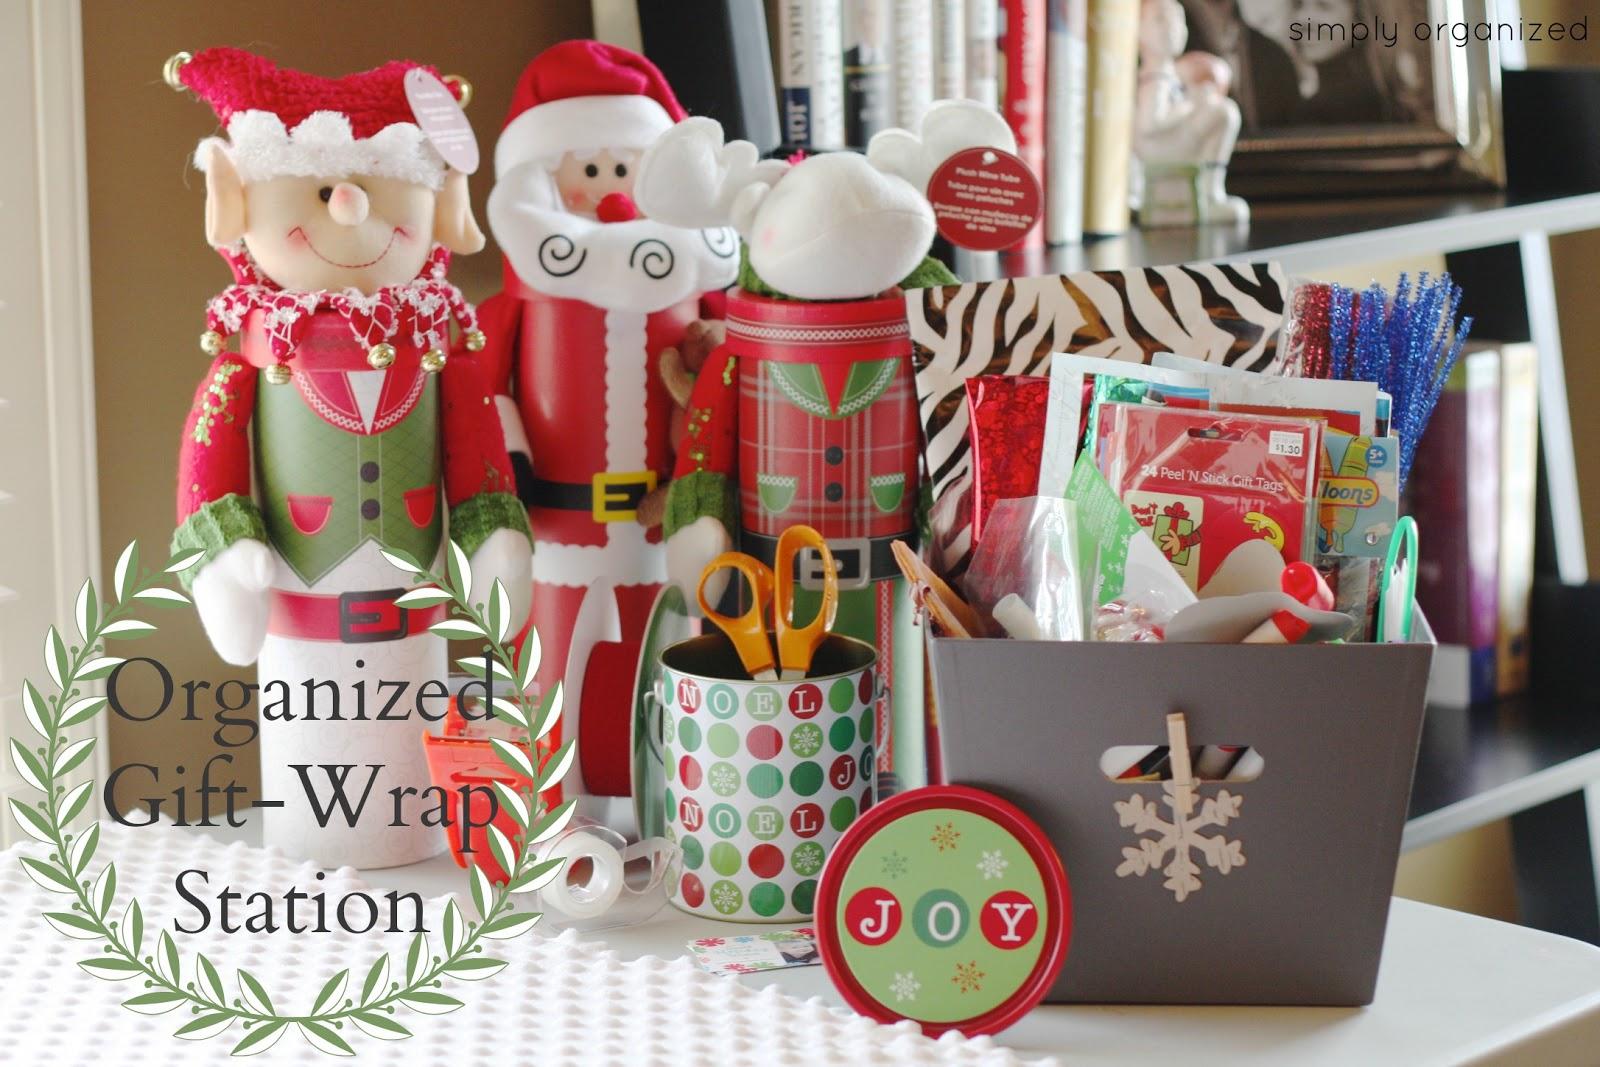 Organized gift wrap station simply organized organized gift wrap station solutioingenieria Choice Image